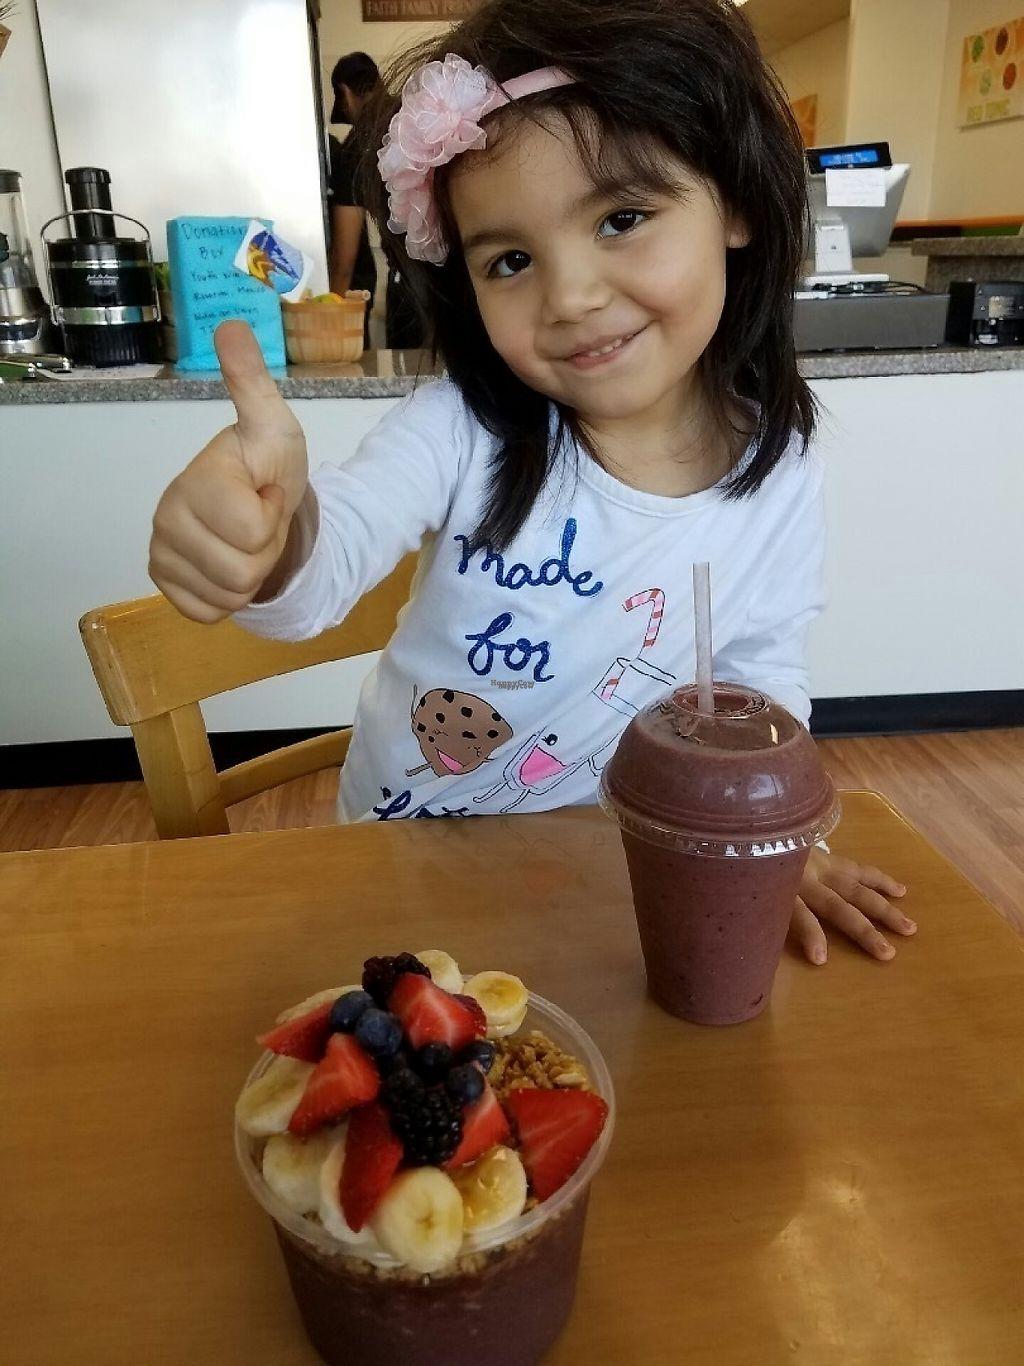 "Photo of Juice Life   by <a href=""/members/profile/JaviGGutierrez"">JaviGGutierrez</a> <br/>babys love Juice life <br/> March 16, 2017  - <a href='/contact/abuse/image/88763/237130'>Report</a>"